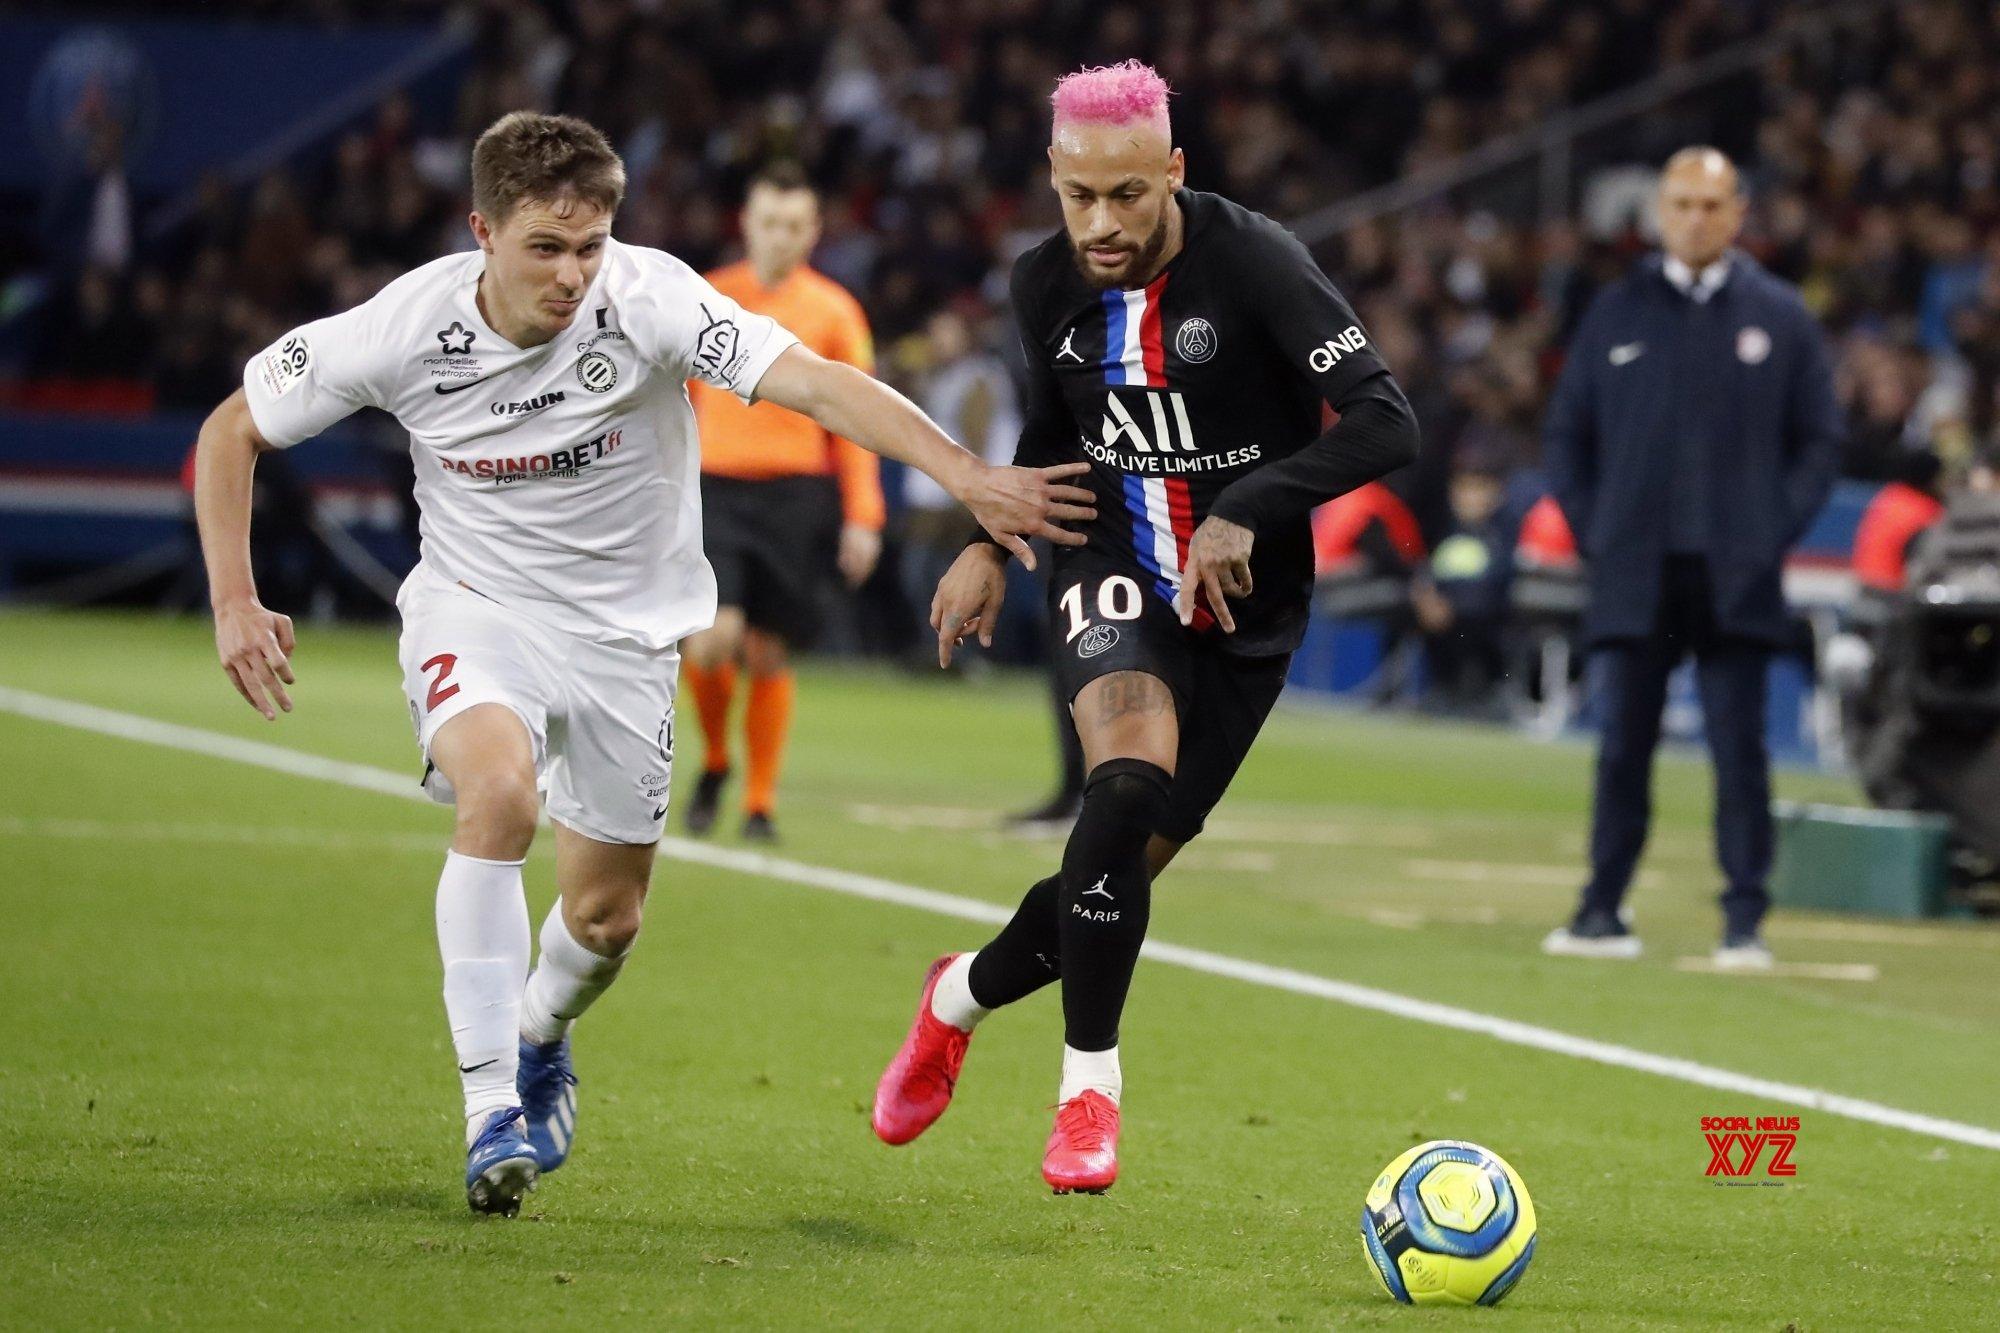 France Paris Soccer Uefa Champions League Psg Vs Montpellier Gallery Social News Xyz